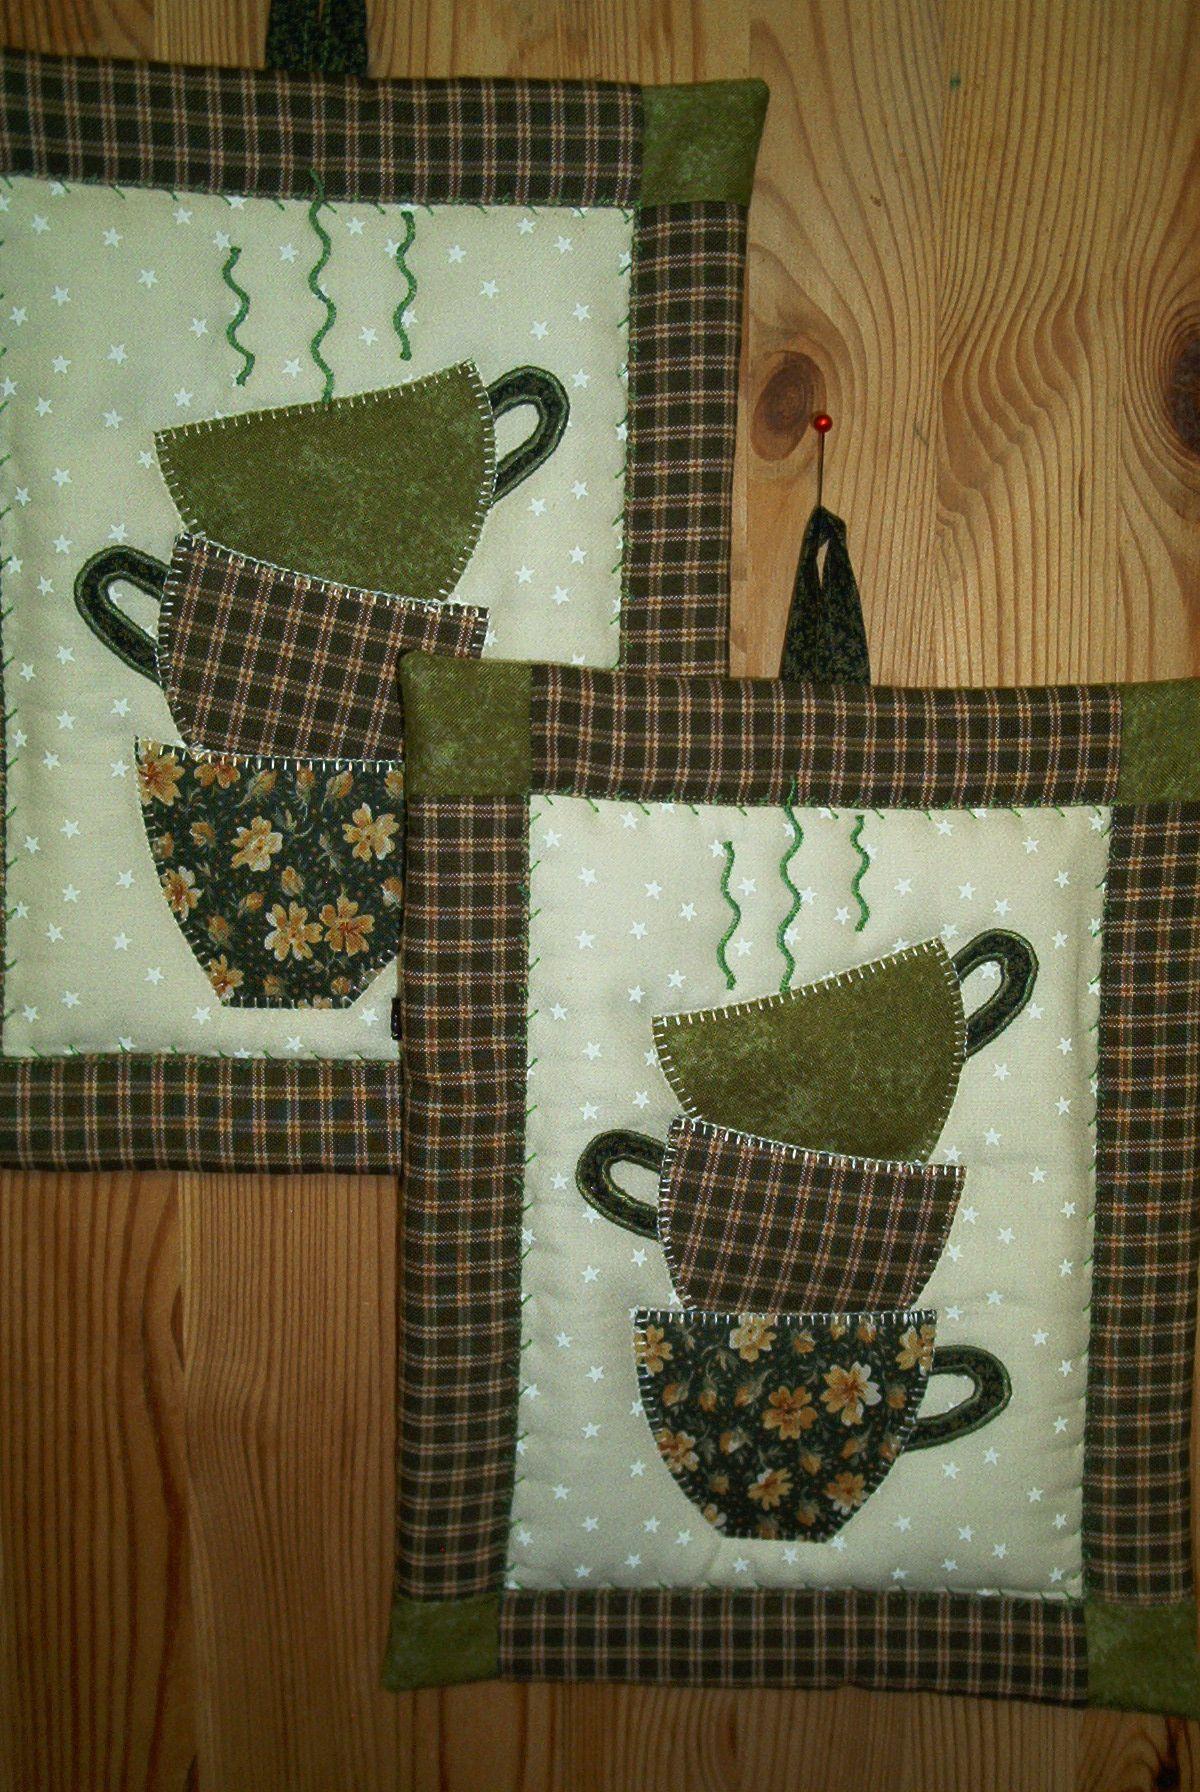 topflappen tassen anleitung n hen pinterest sewing quilts und mug rugs. Black Bedroom Furniture Sets. Home Design Ideas